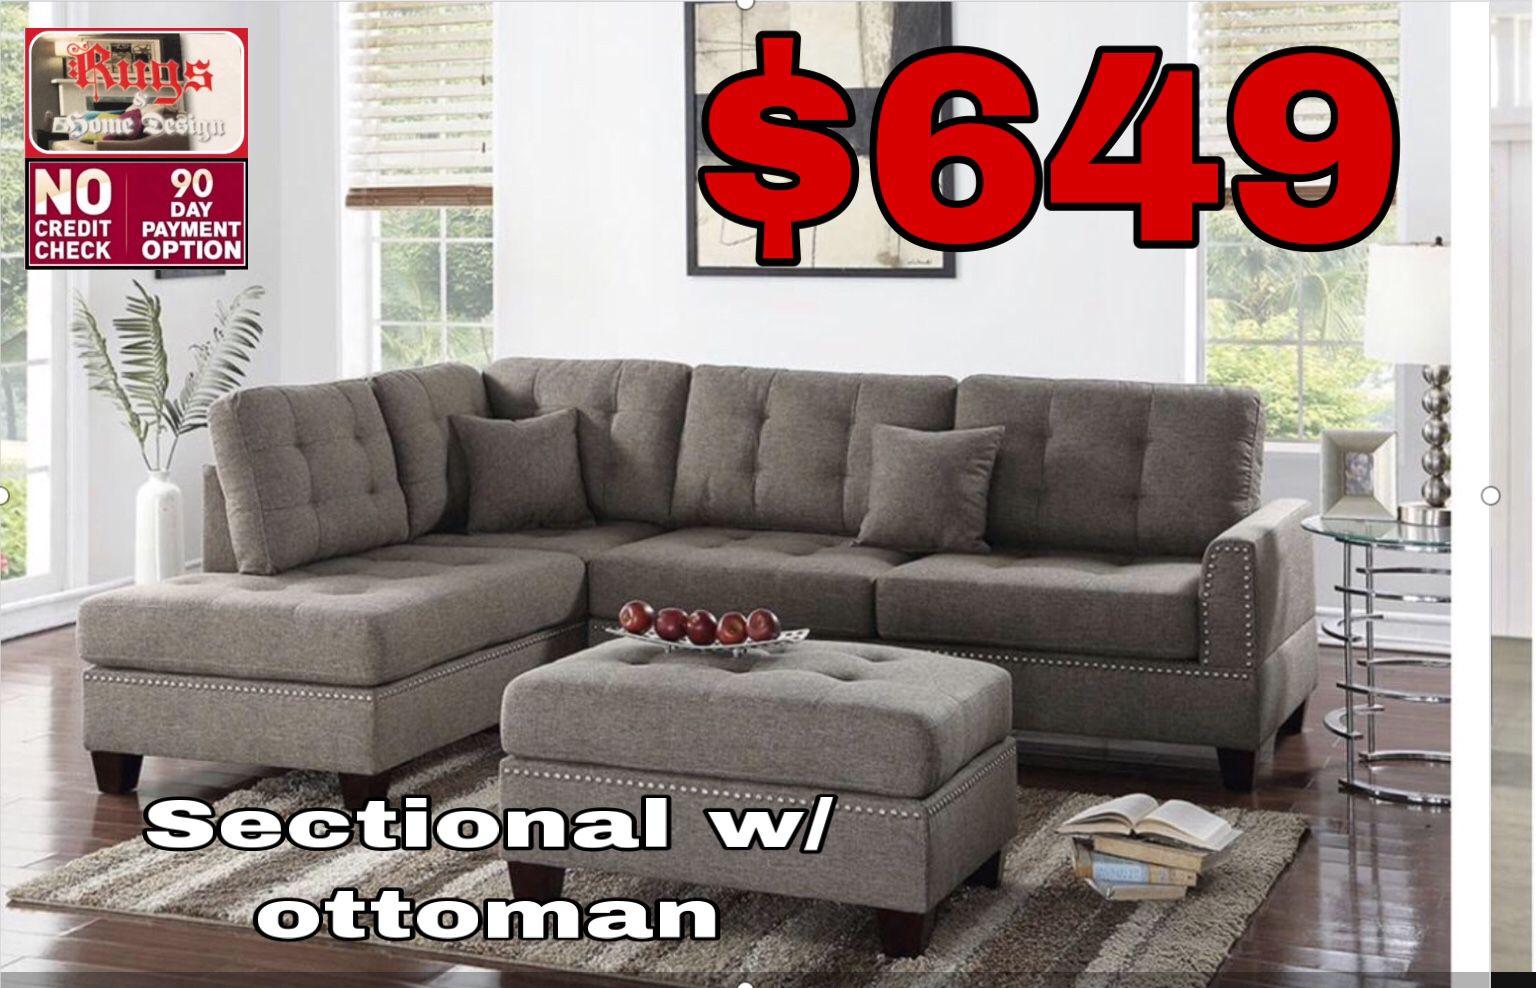 Sectional w/ ottoman